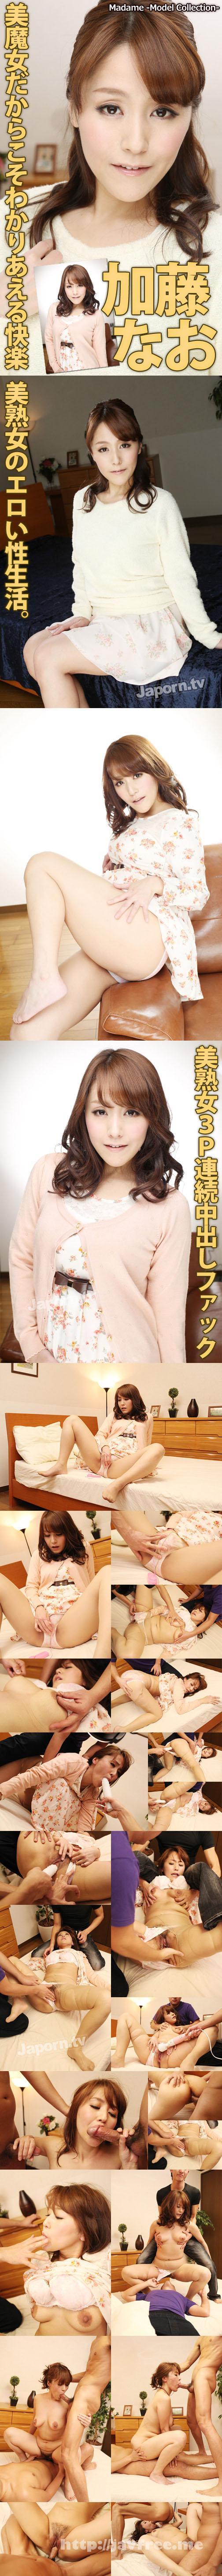 [BT-125] Madame -Model Collection- : 加藤なお - image BT-125a on https://javfree.me